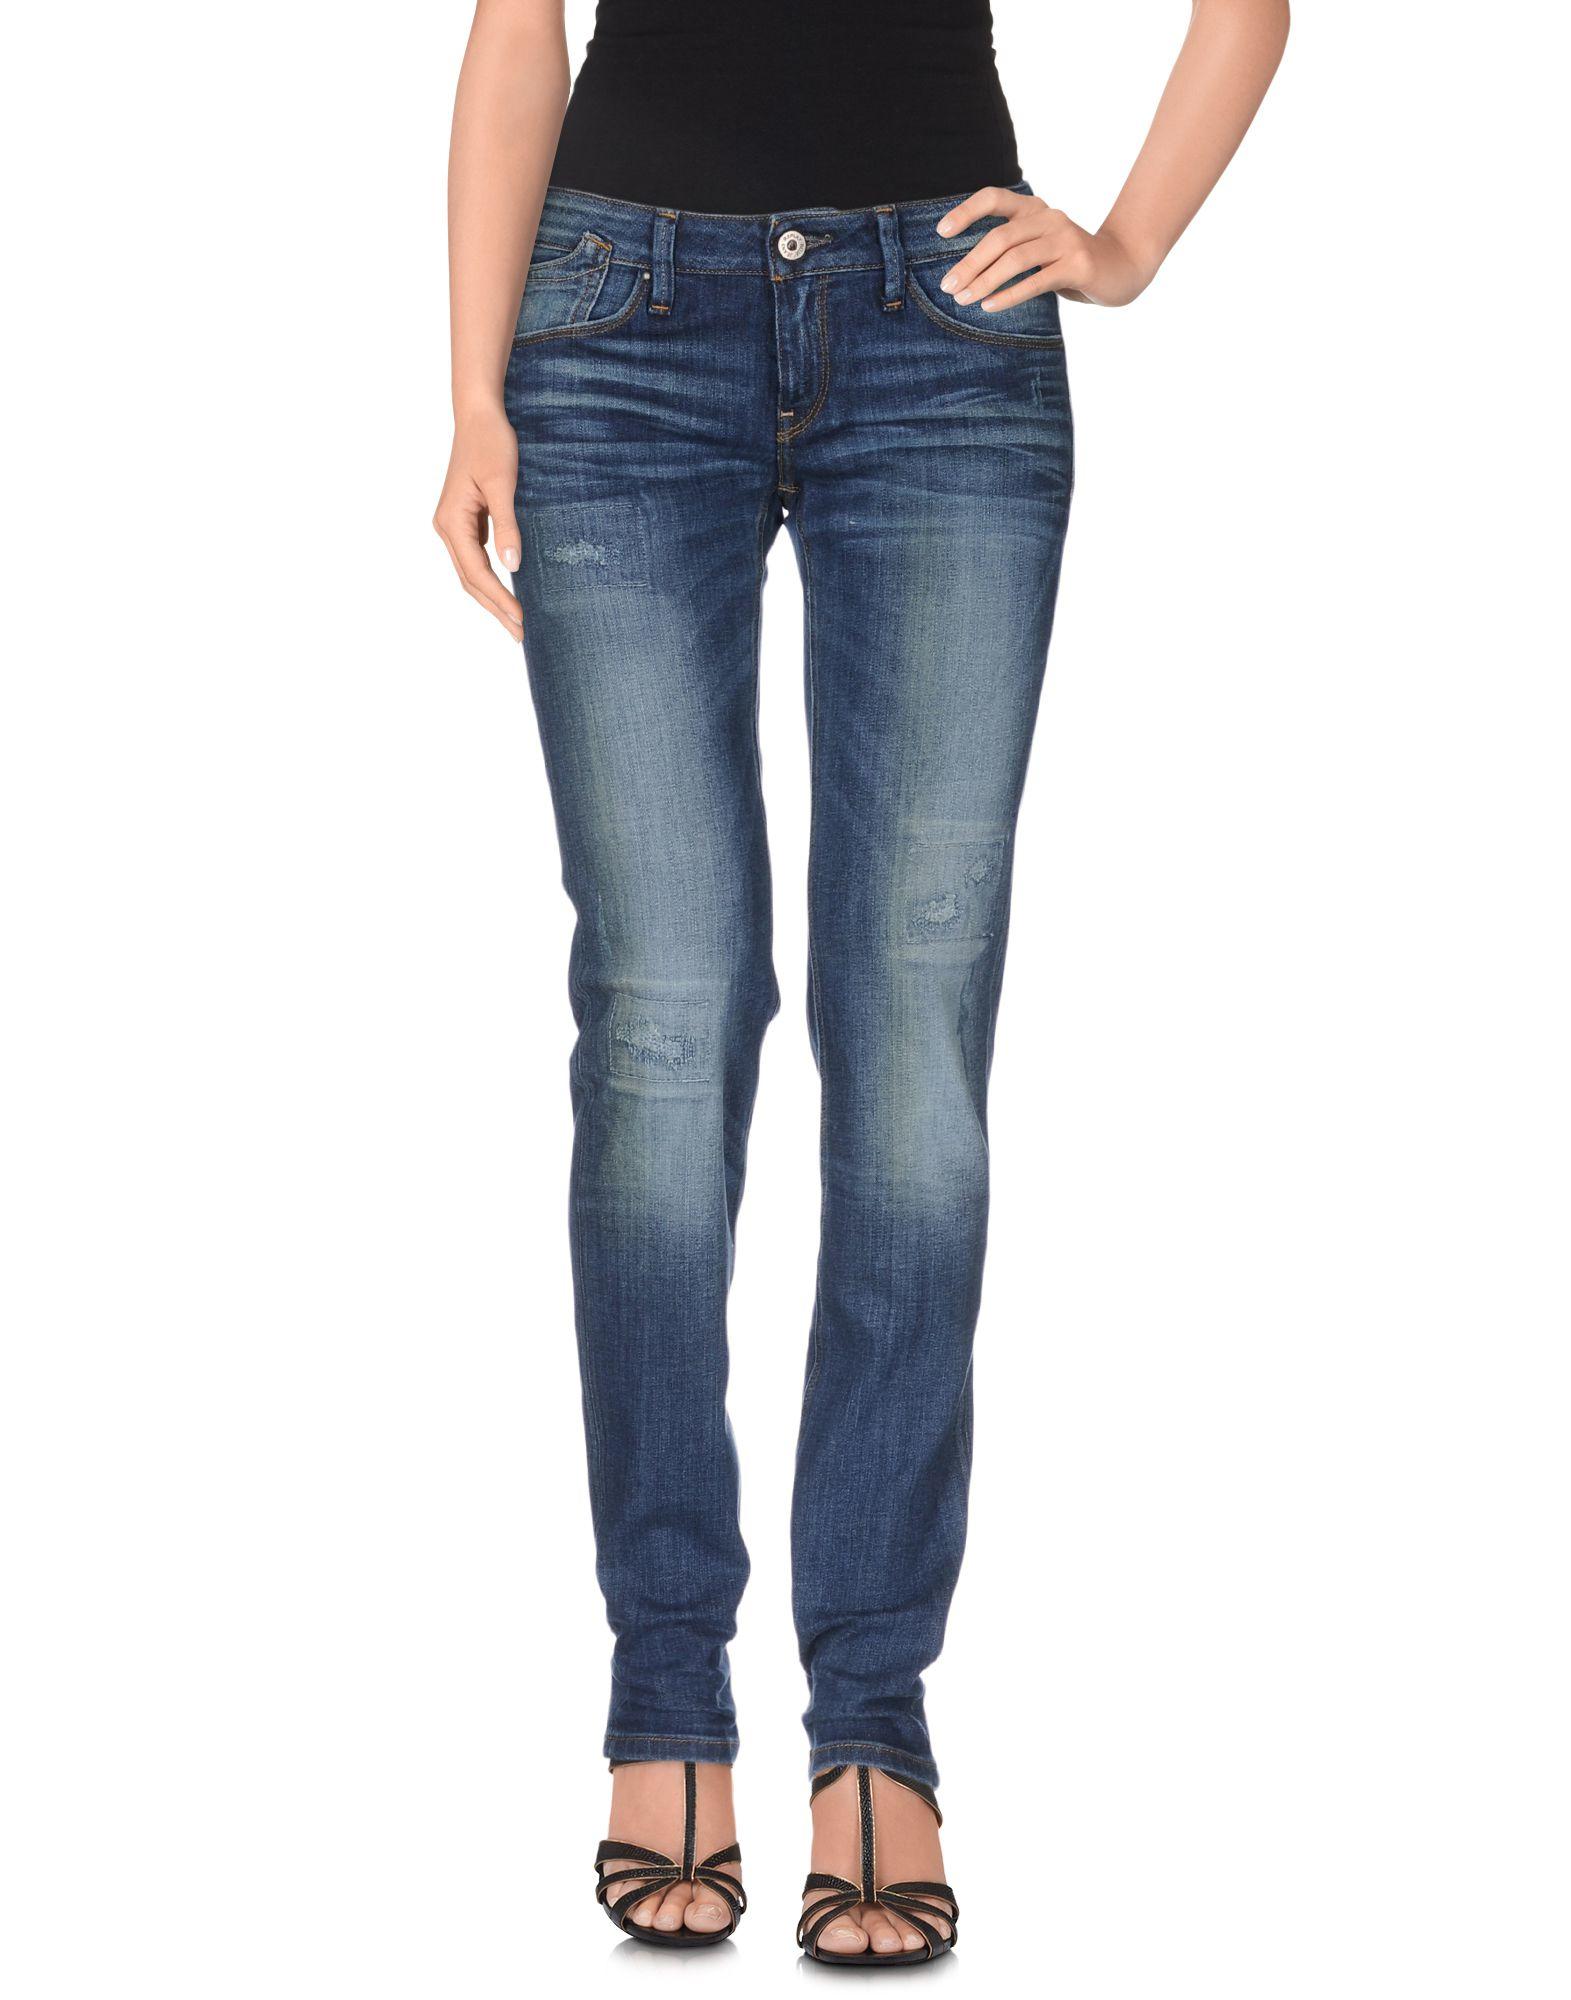 Lyst - Replay Denim Trousers in Blue